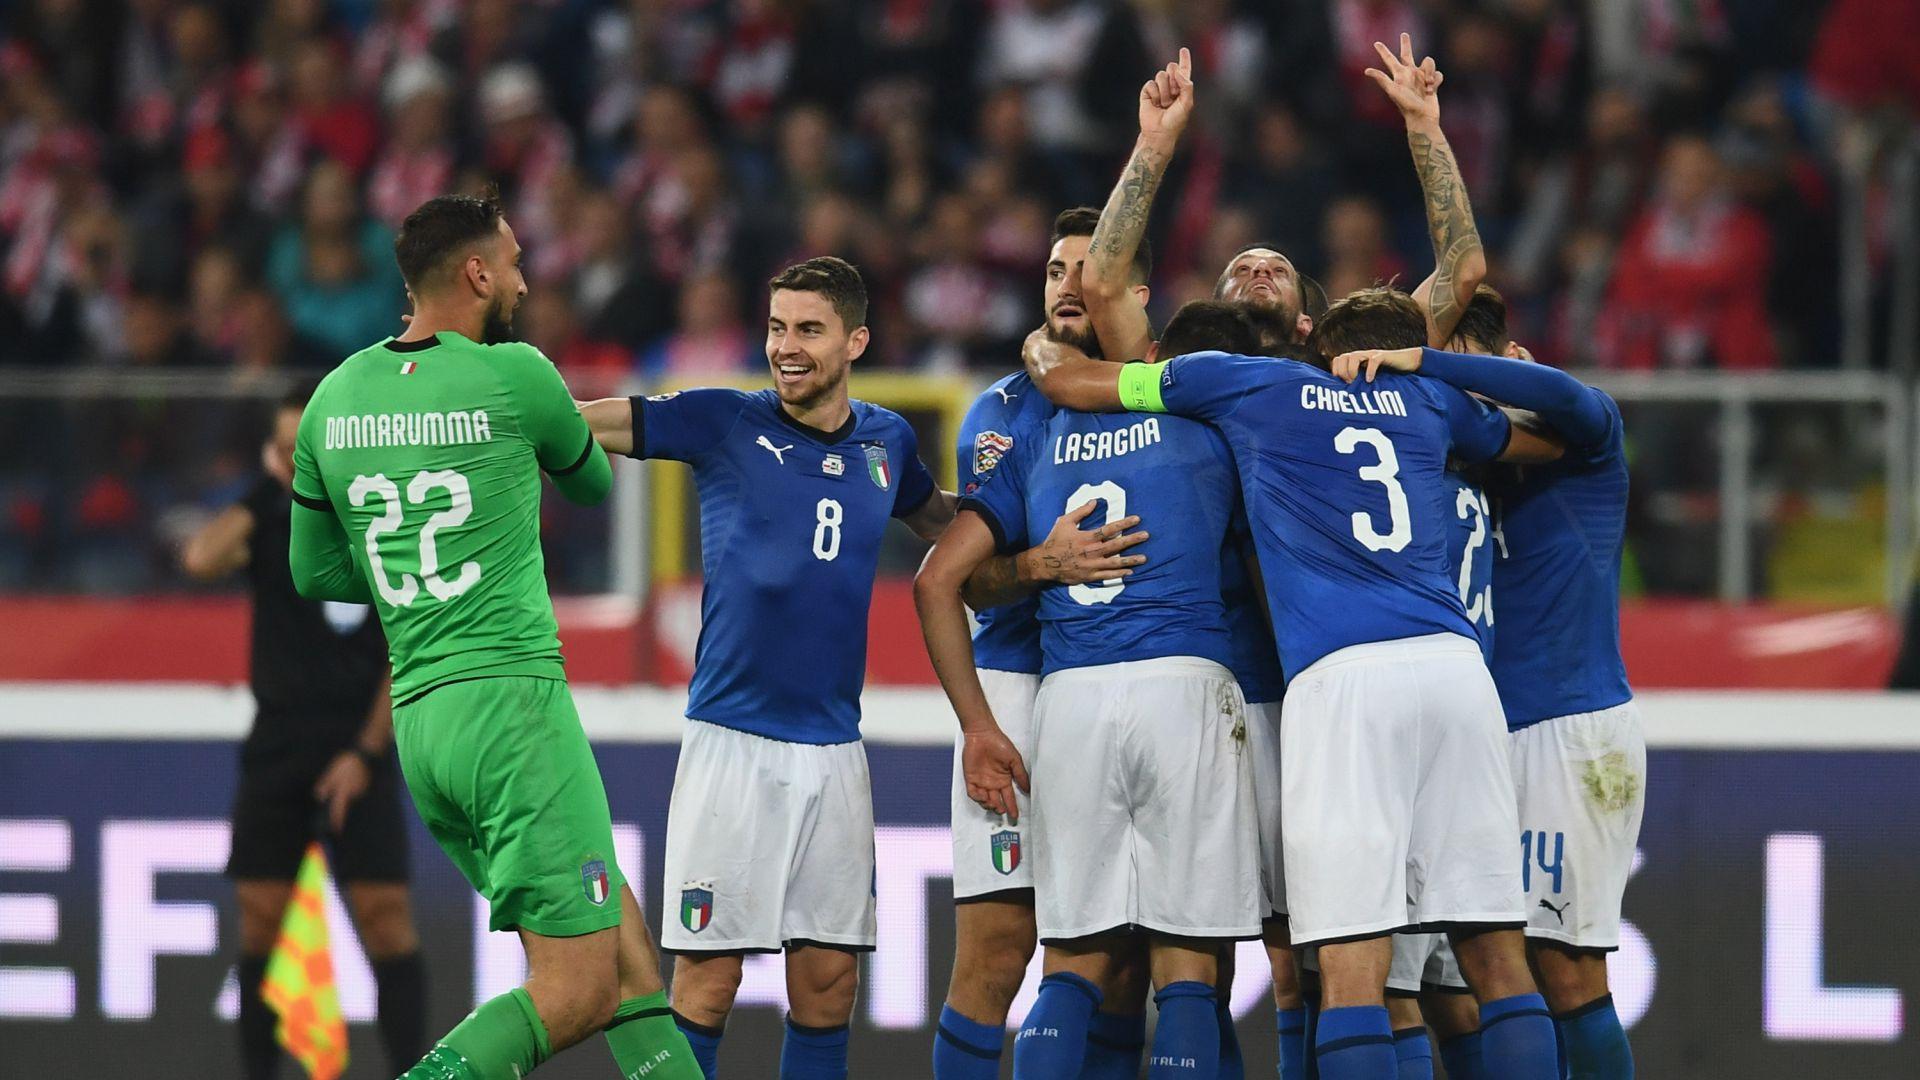 Portugal will host inaugural UEFA Nations League final four